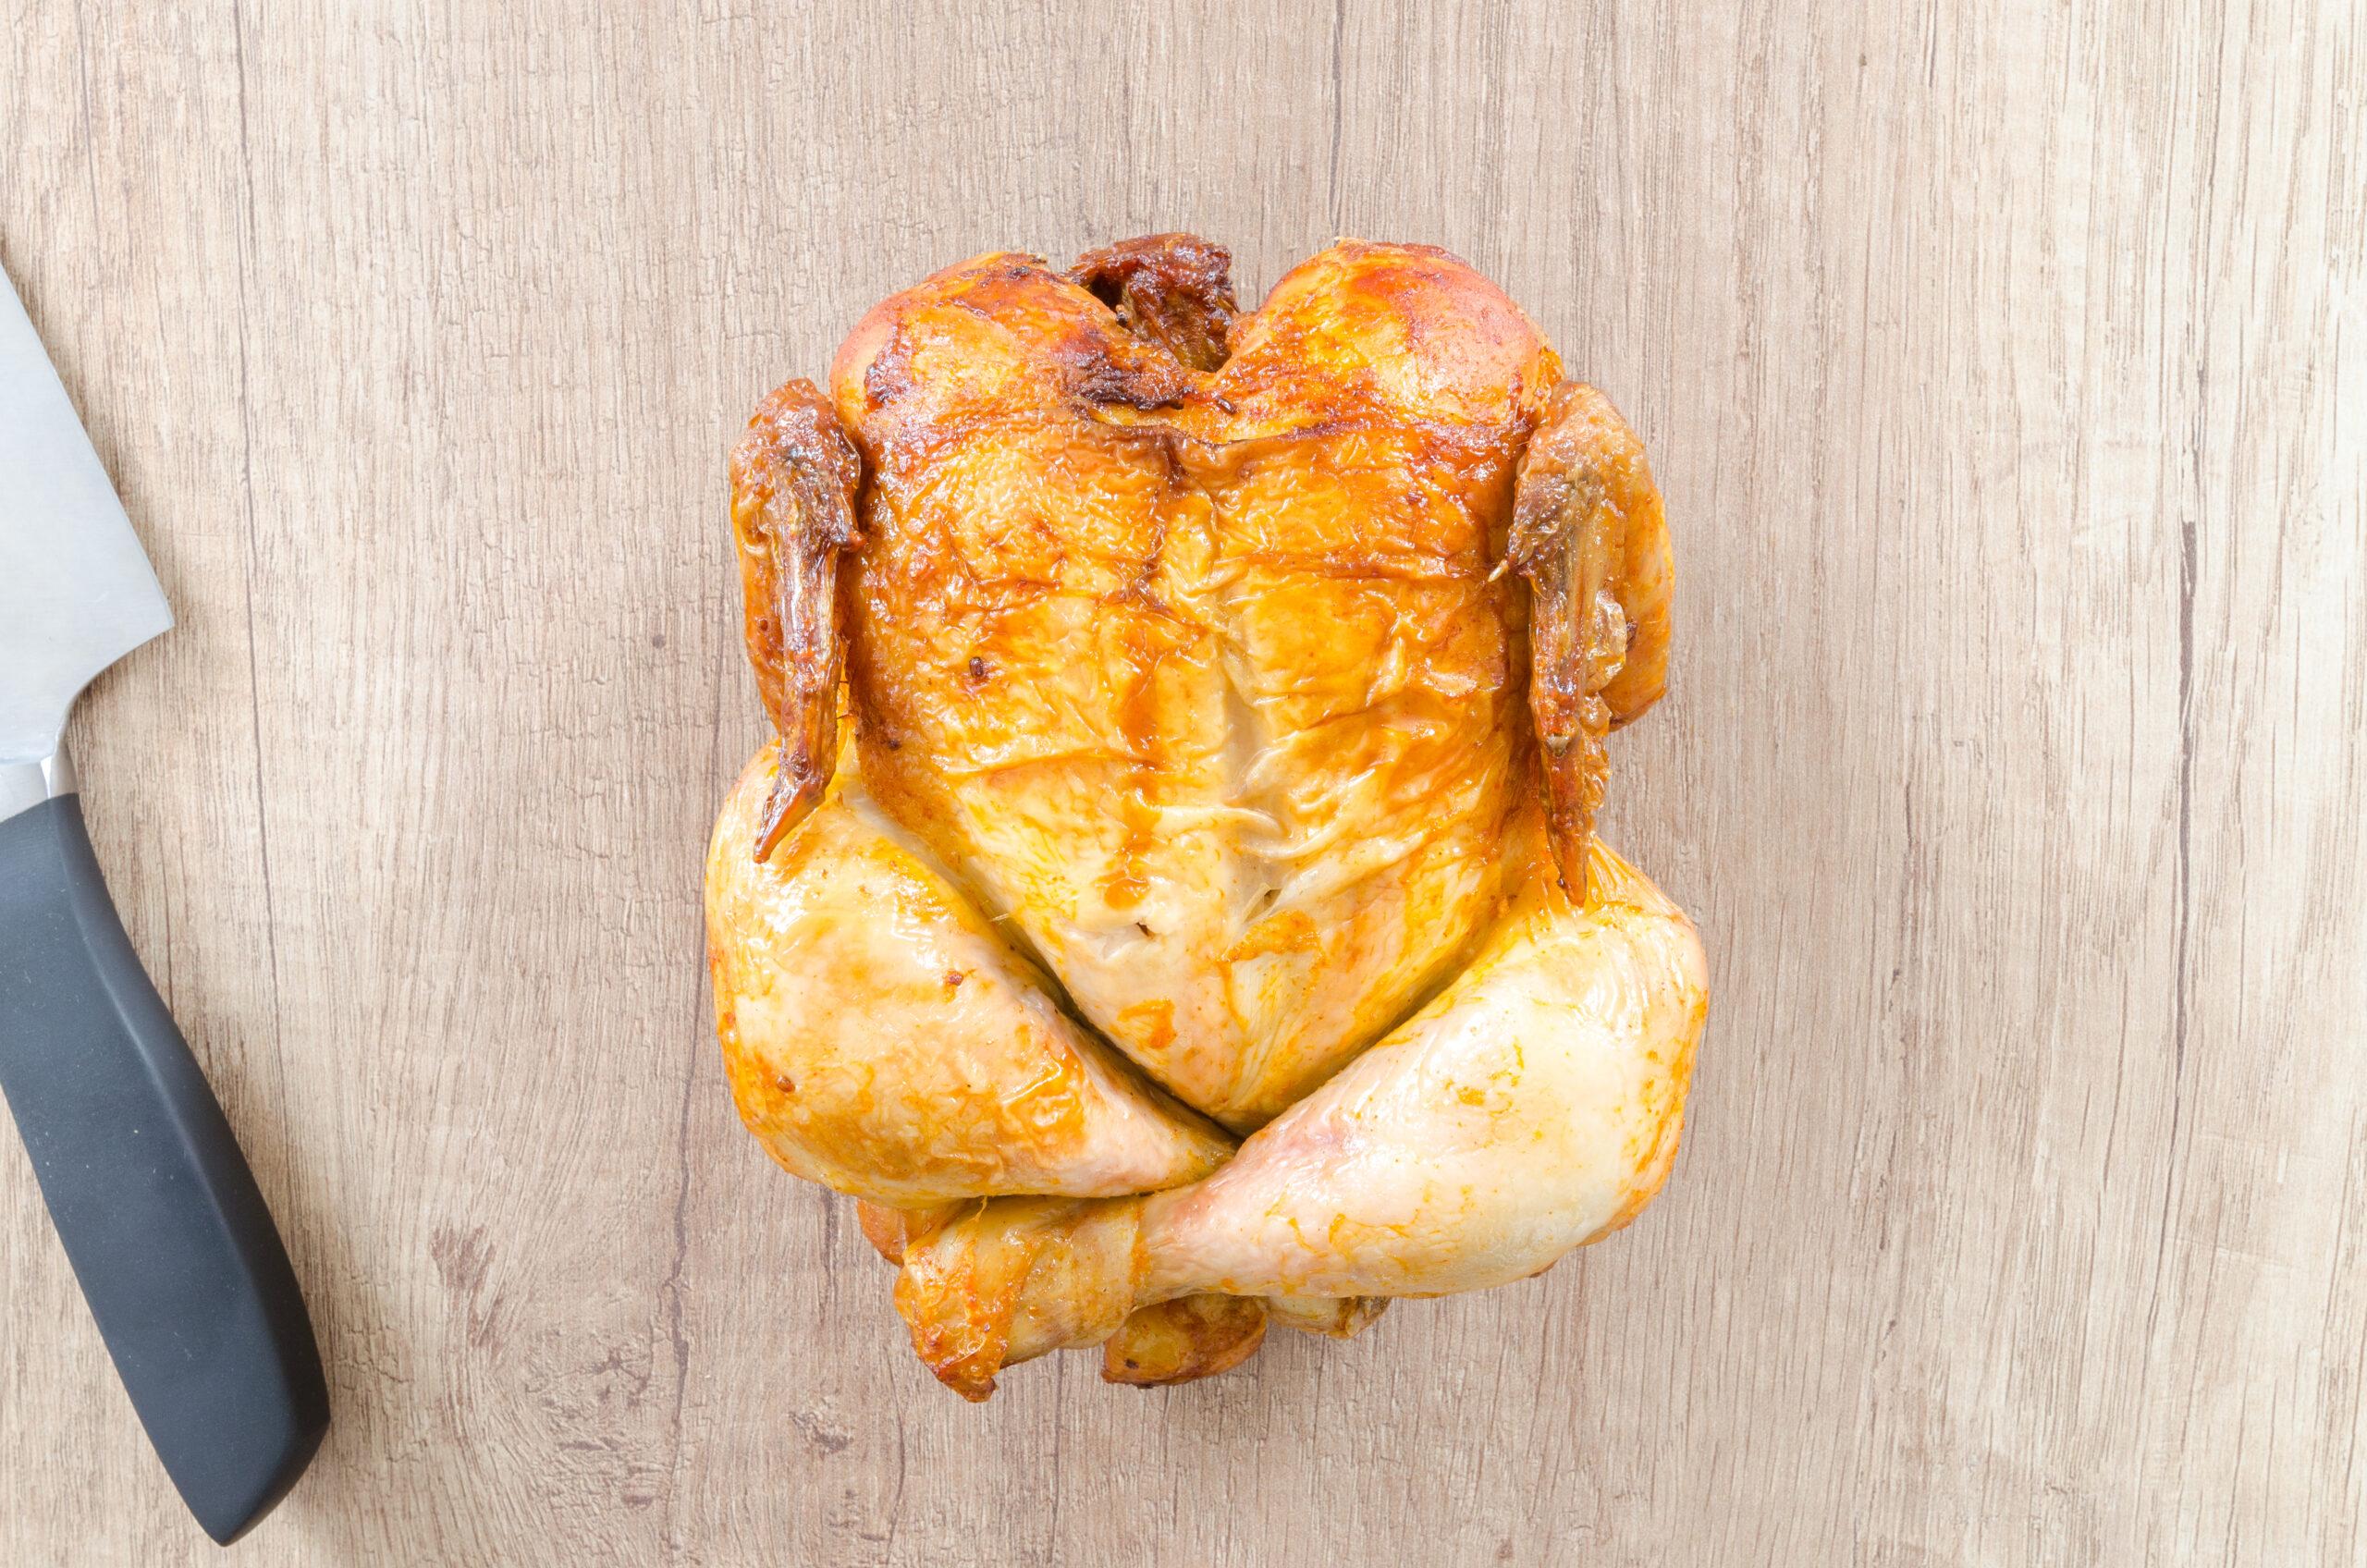 Cookbook Series: One Pan Potatoes & Chicken